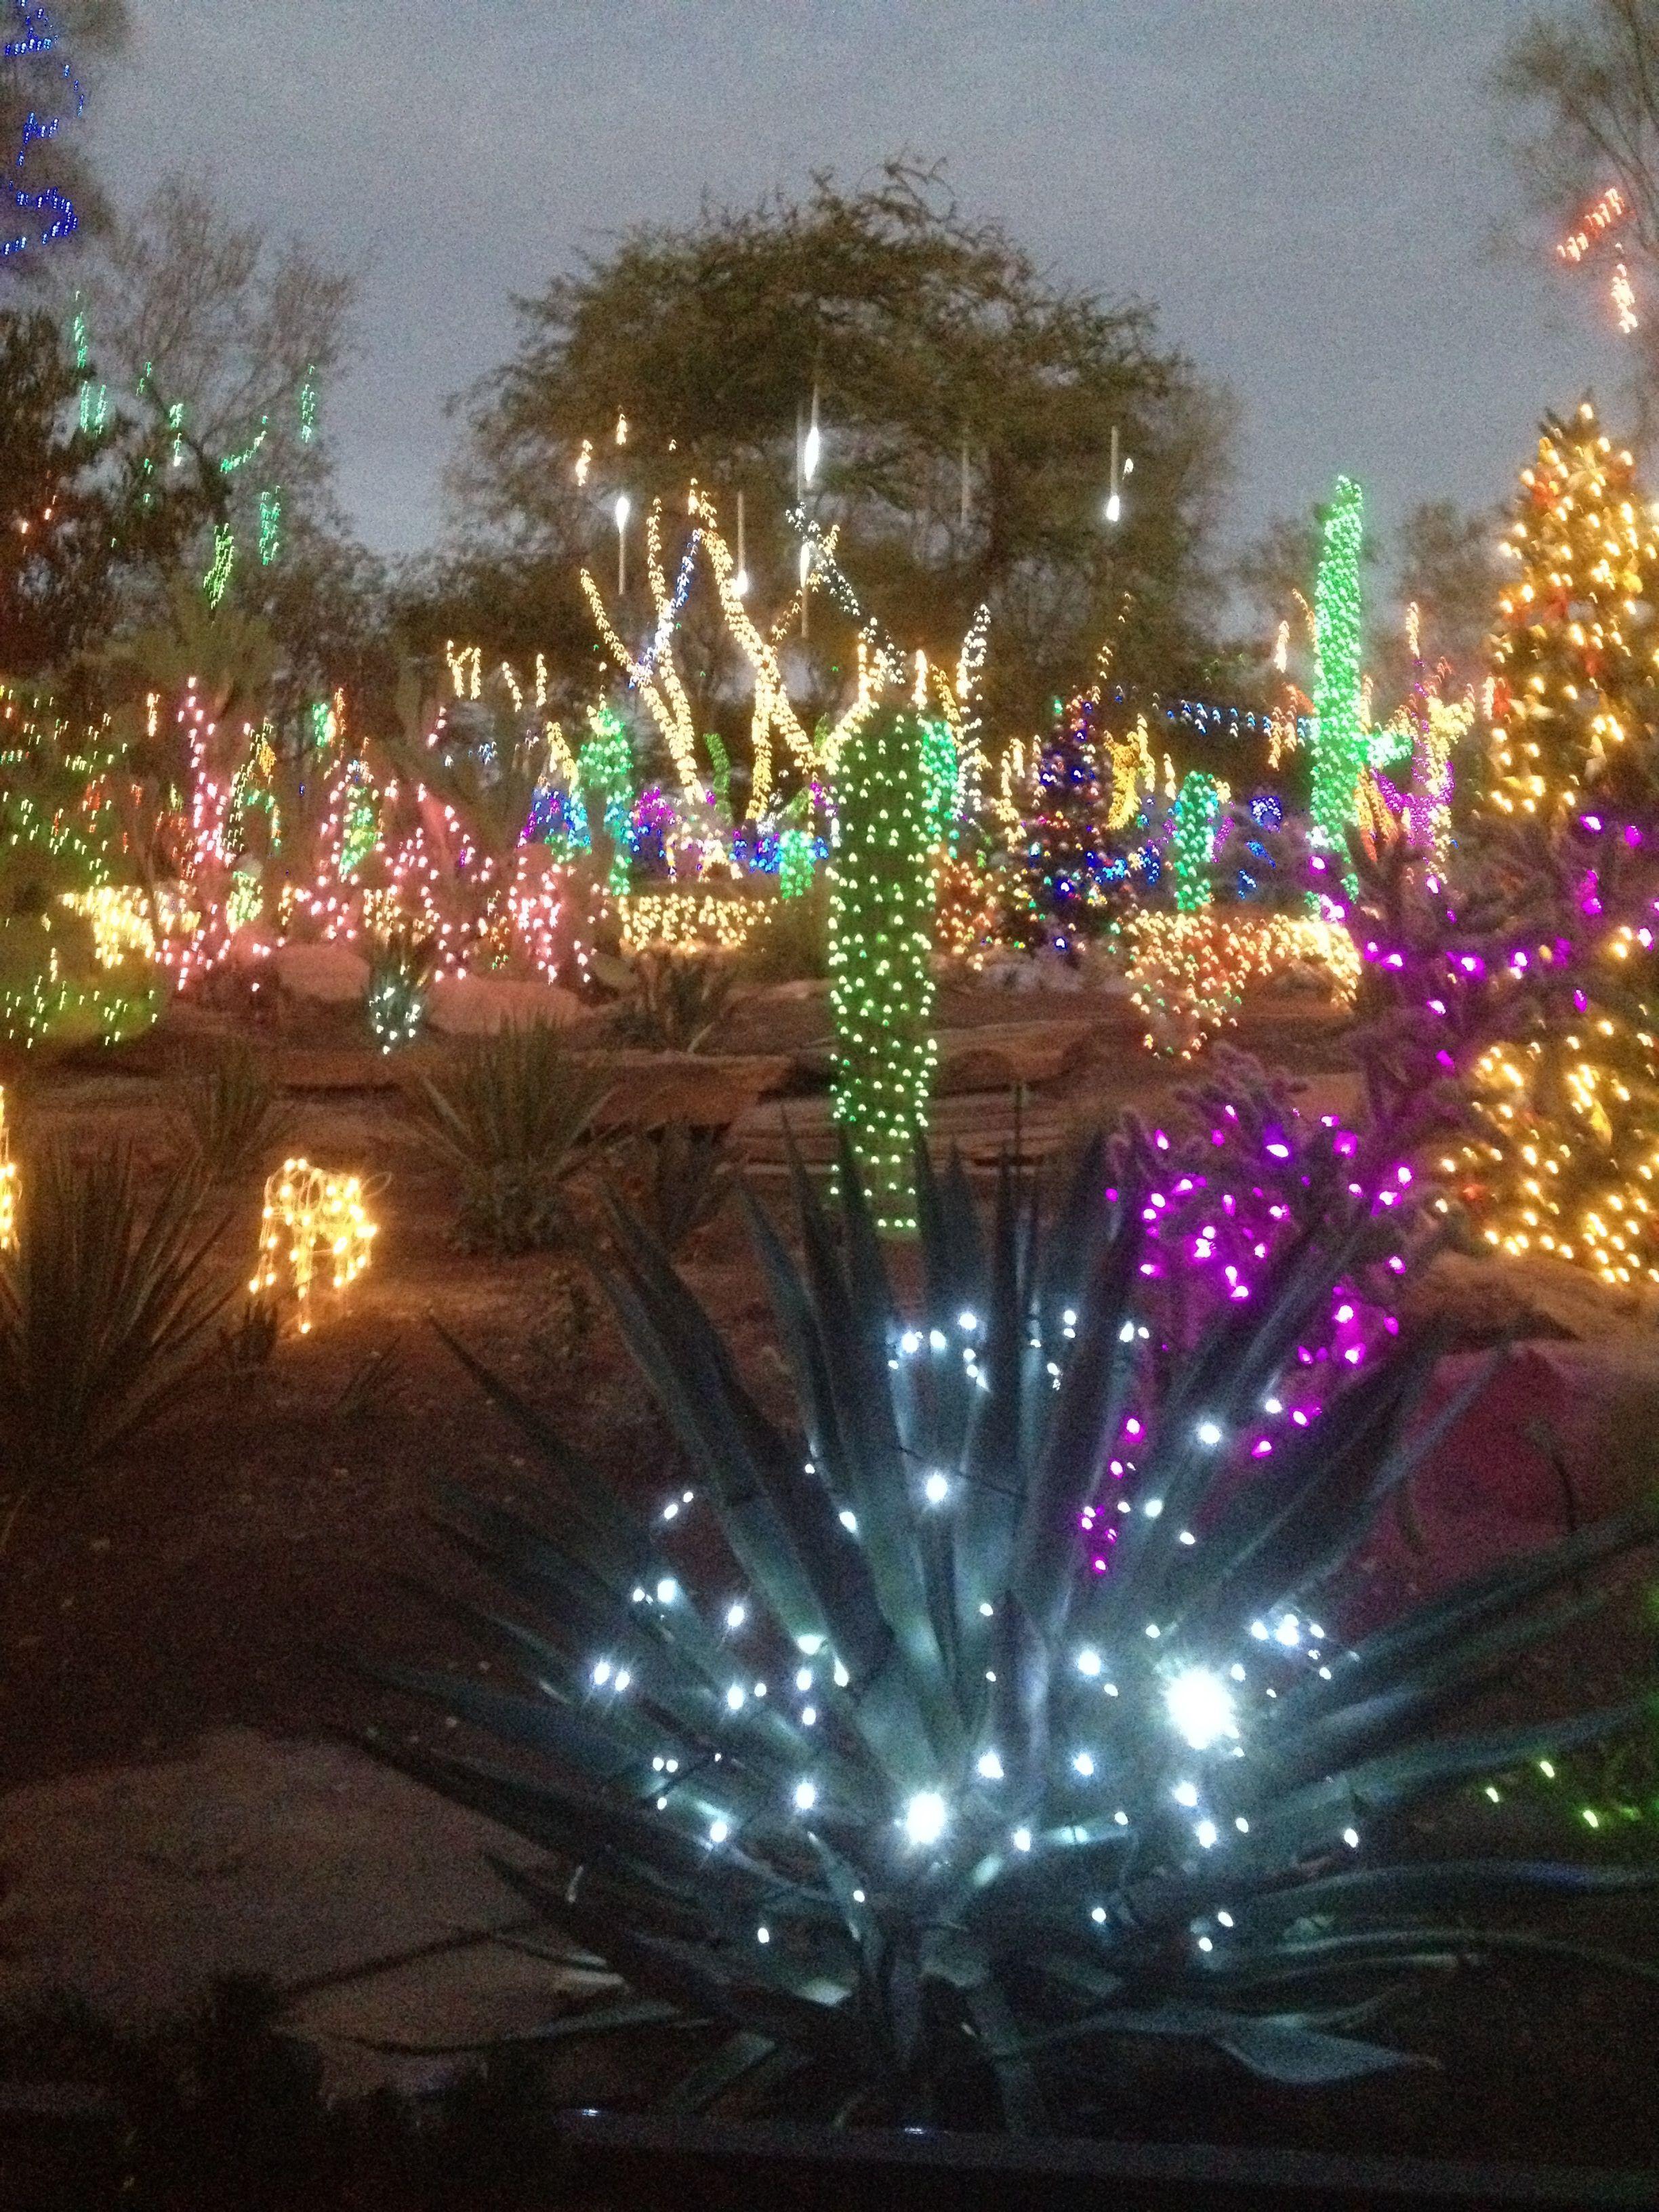 Xmas in Vegas. Cactus garden at Ethel M's Chocolate